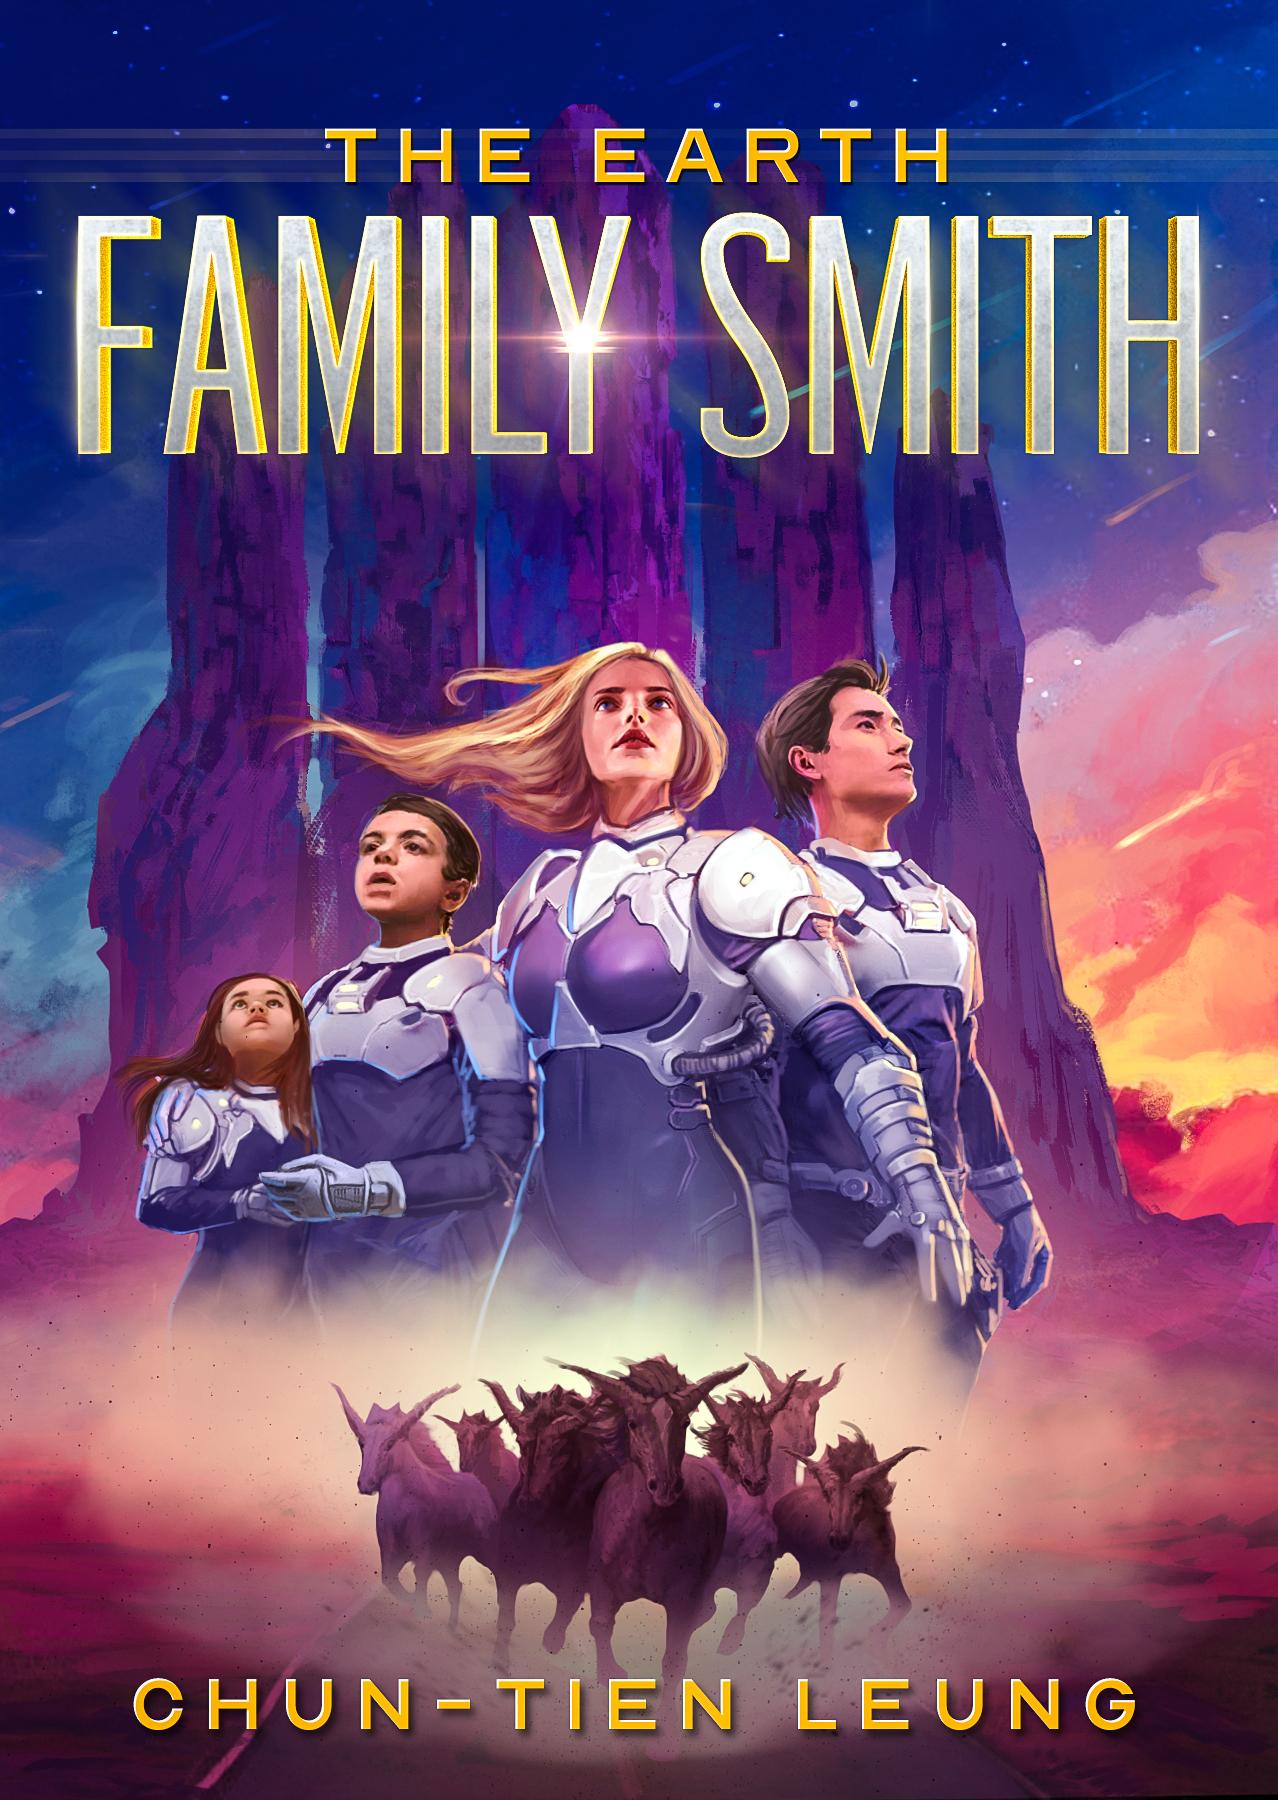 The Earth Family Smith